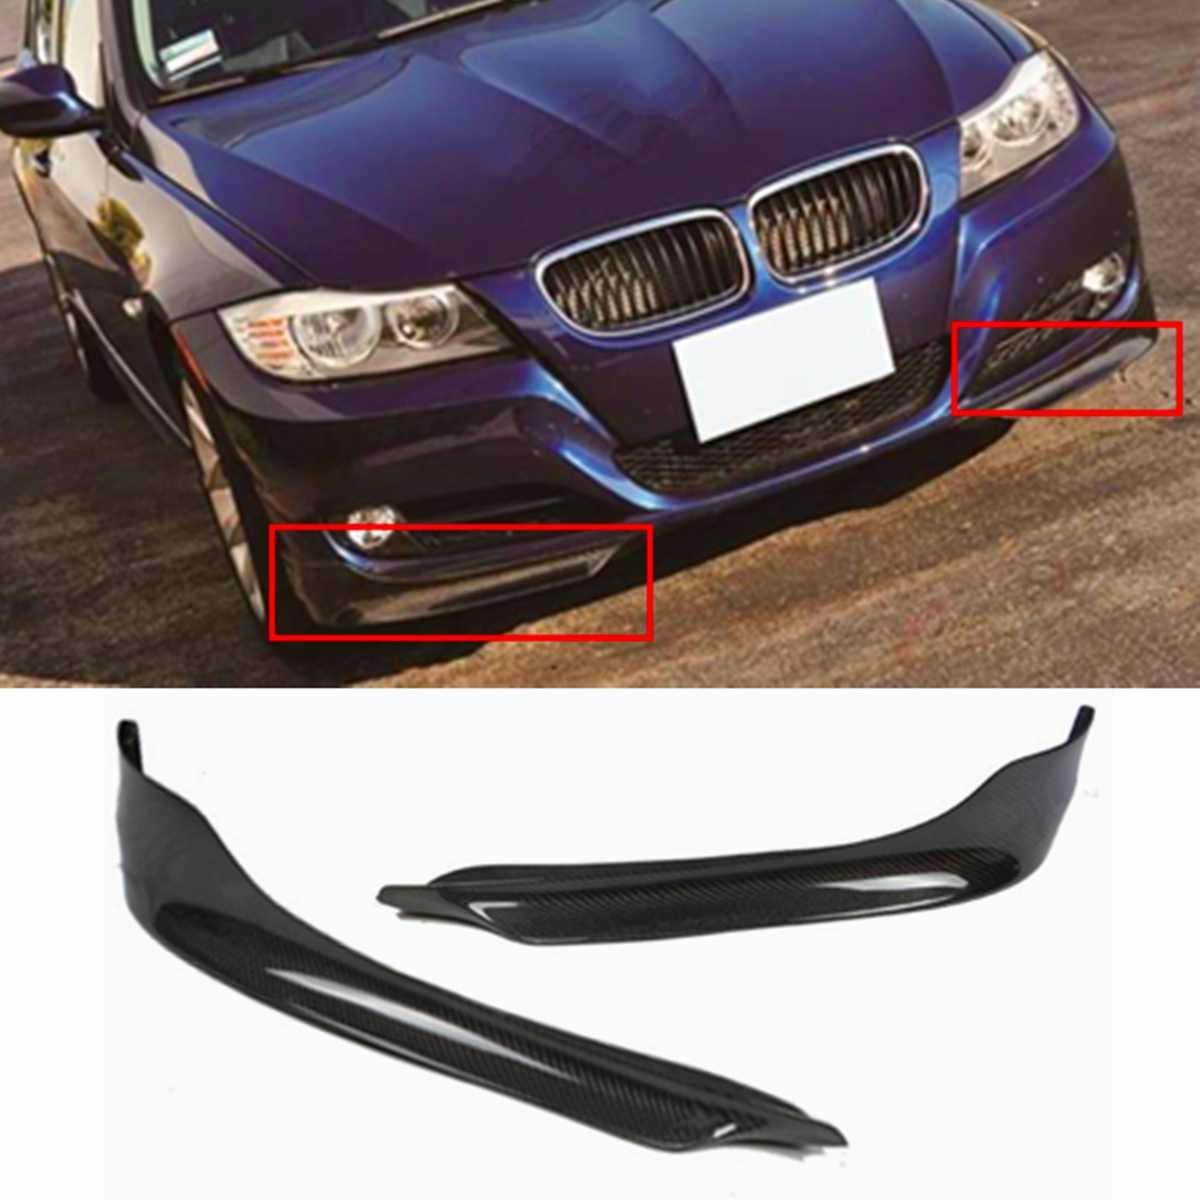 Neue 2x Real Carbon Fiber Car Front Lip Splitter Abdeckung Für BMW E90 E91 3-Serie 4Dr Limousine 2009-2011 Frontschürze Spoiler